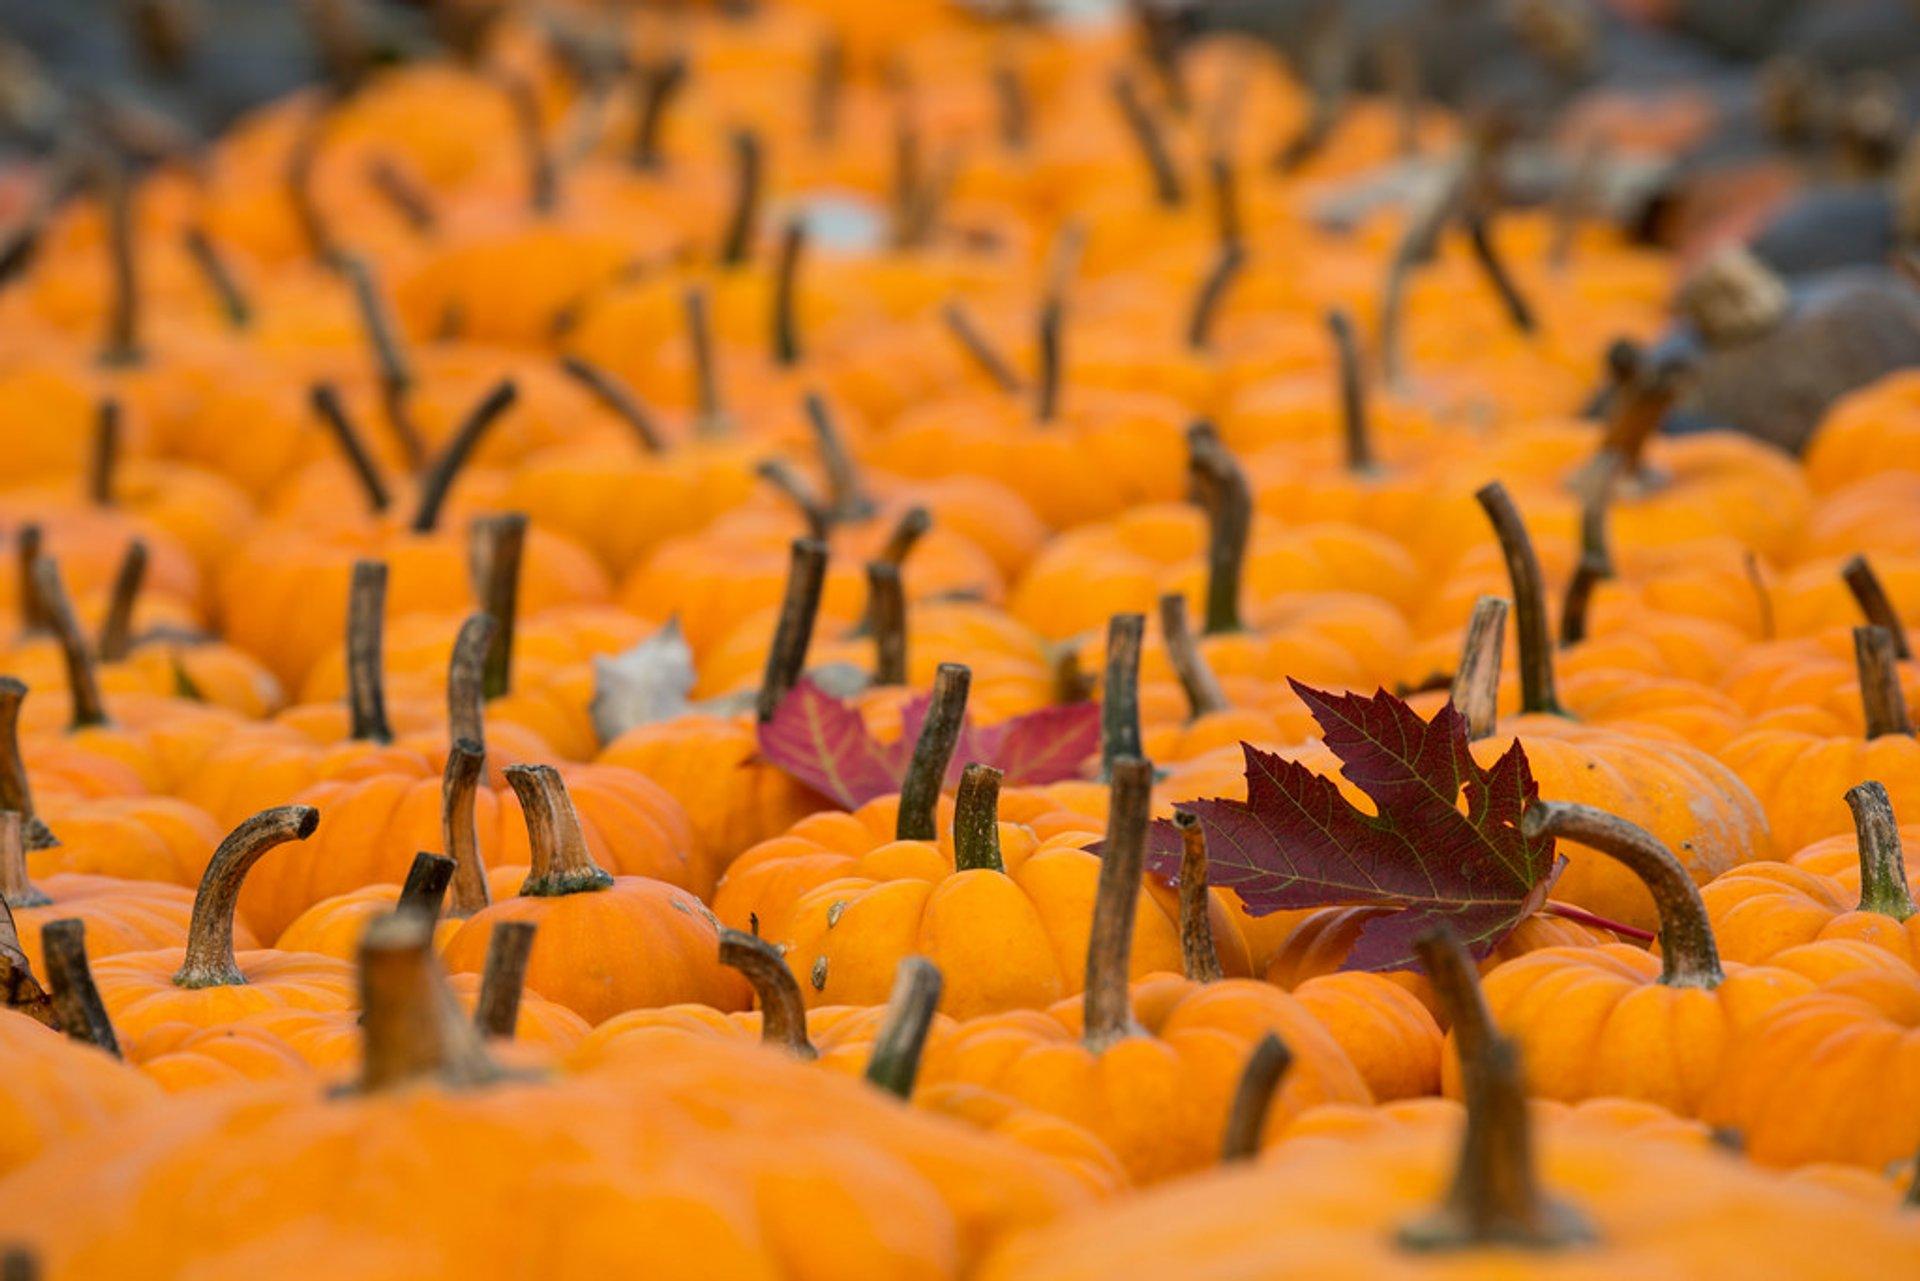 Ludwigsburg Pumpkin Festival in Germany 2019 - Best Time